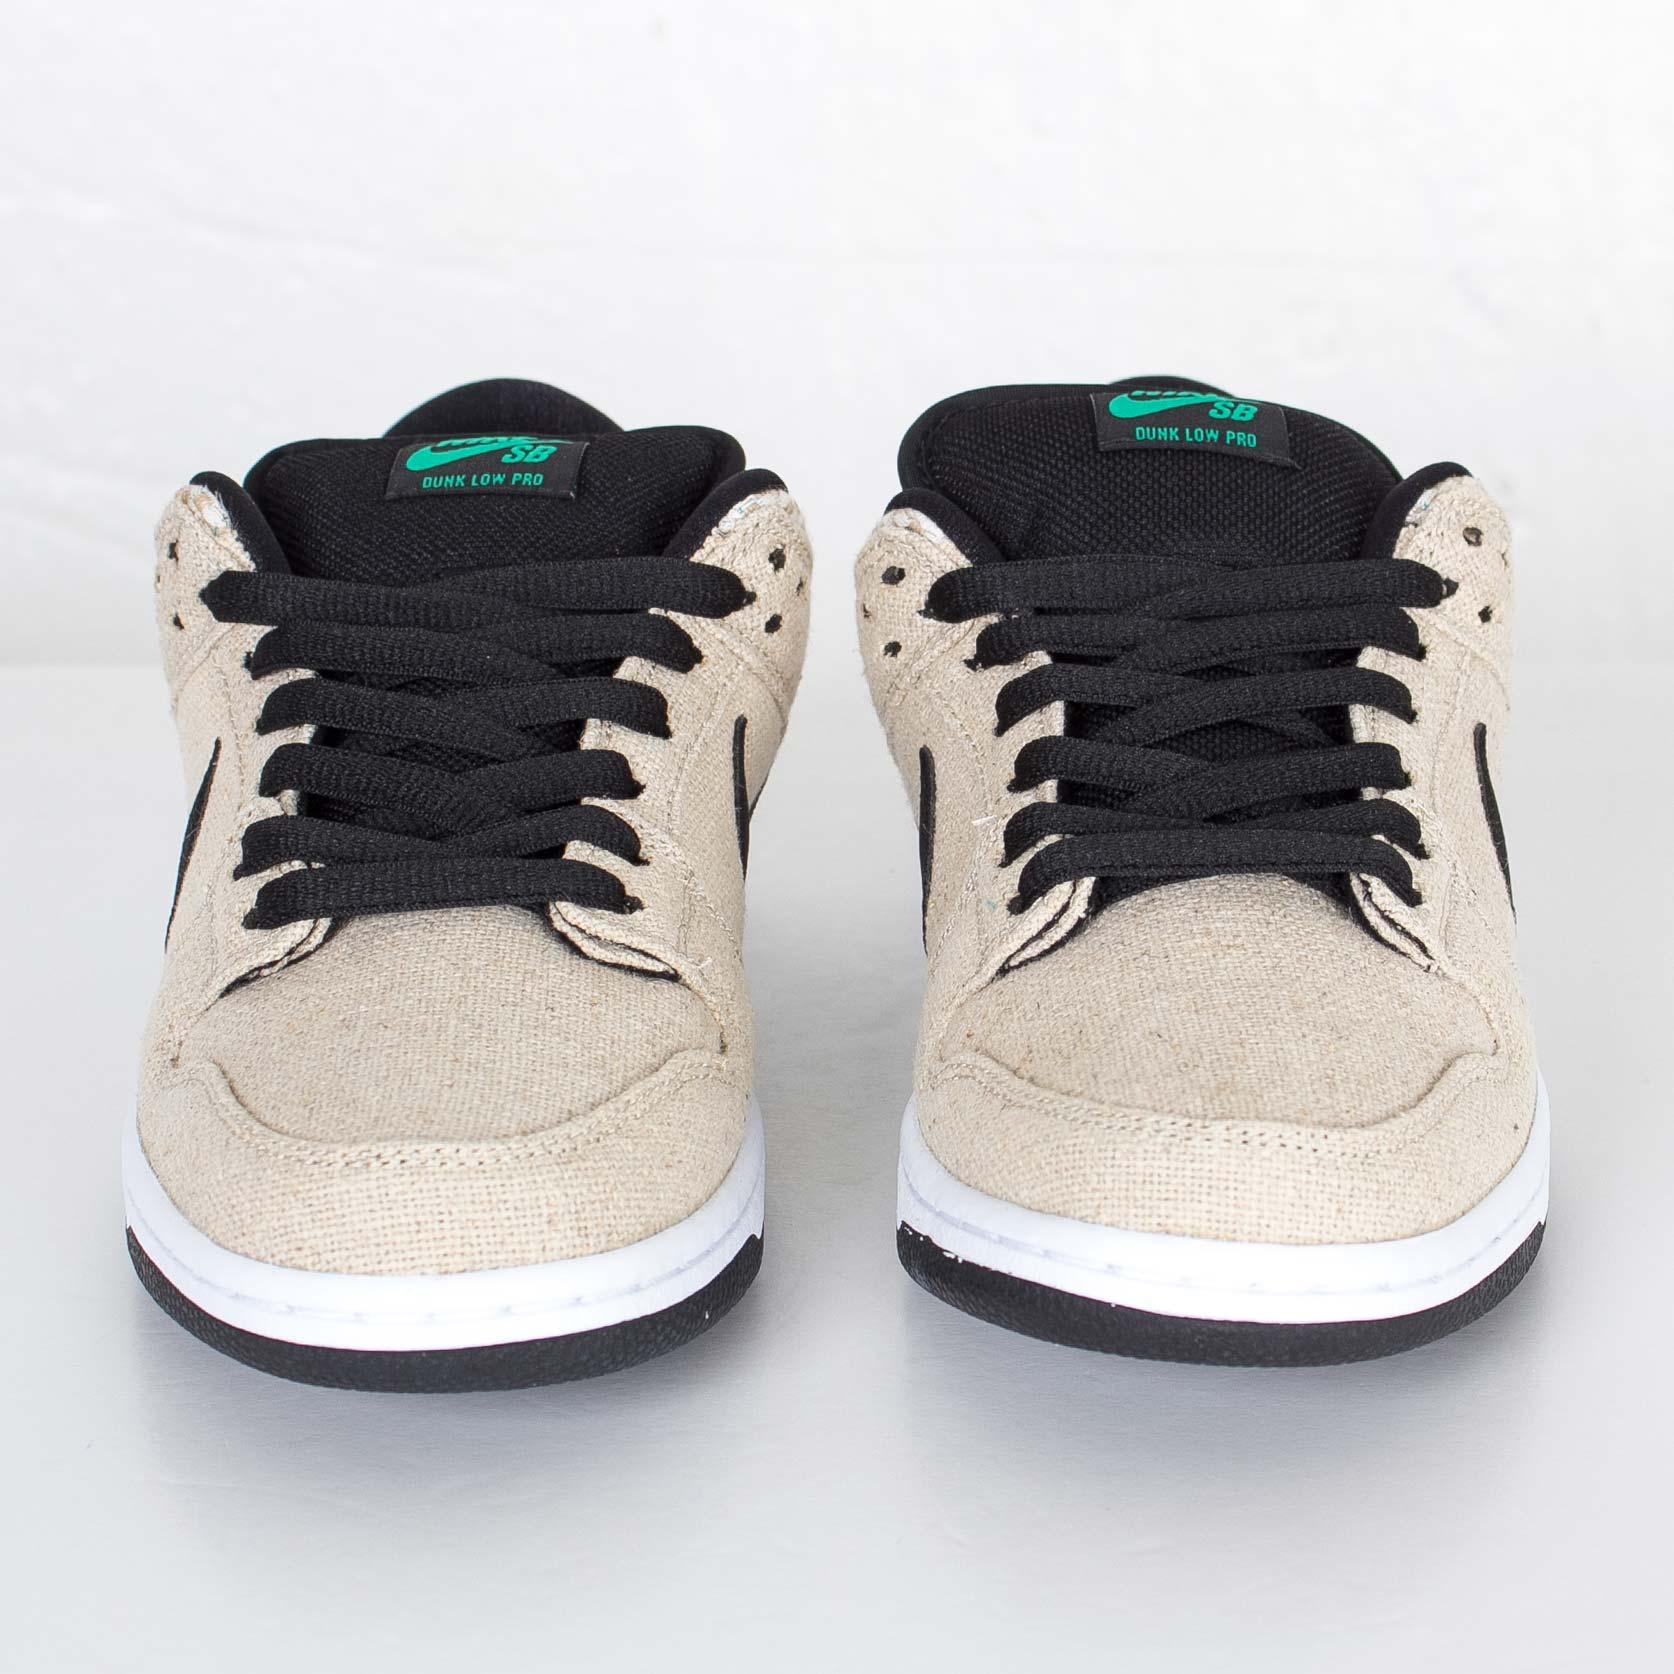 reputable site c2e47 dace2 Nike Dunk Low Premium SB - 313170-206 - Sneakersnstuff   sneakers    streetwear online since 1999